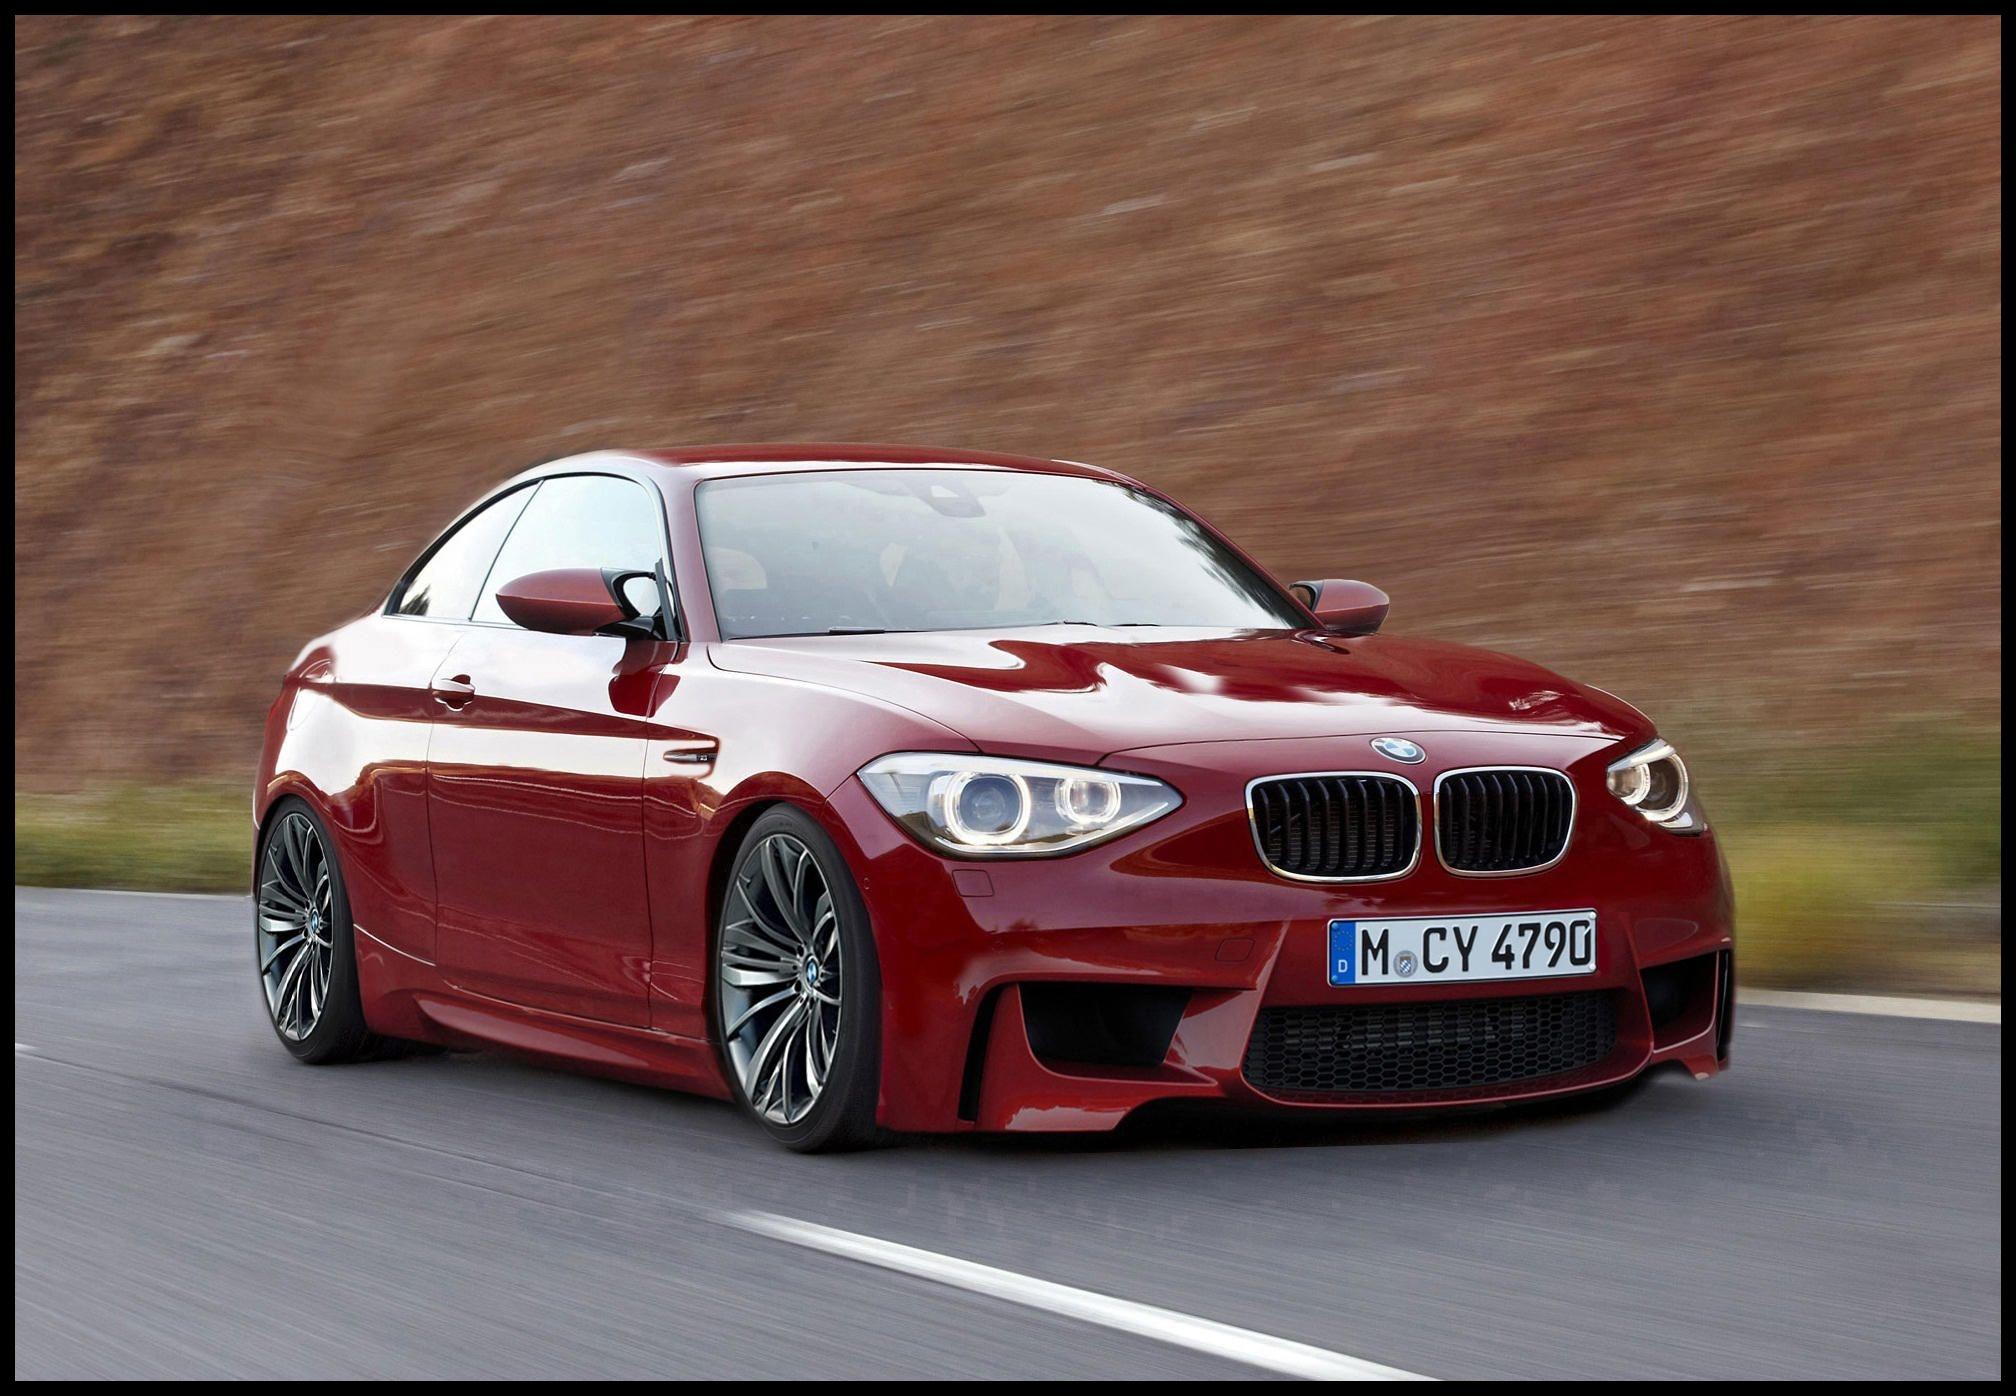 1m Bmw Price Luxury Bmw 1m Cars Pinterest